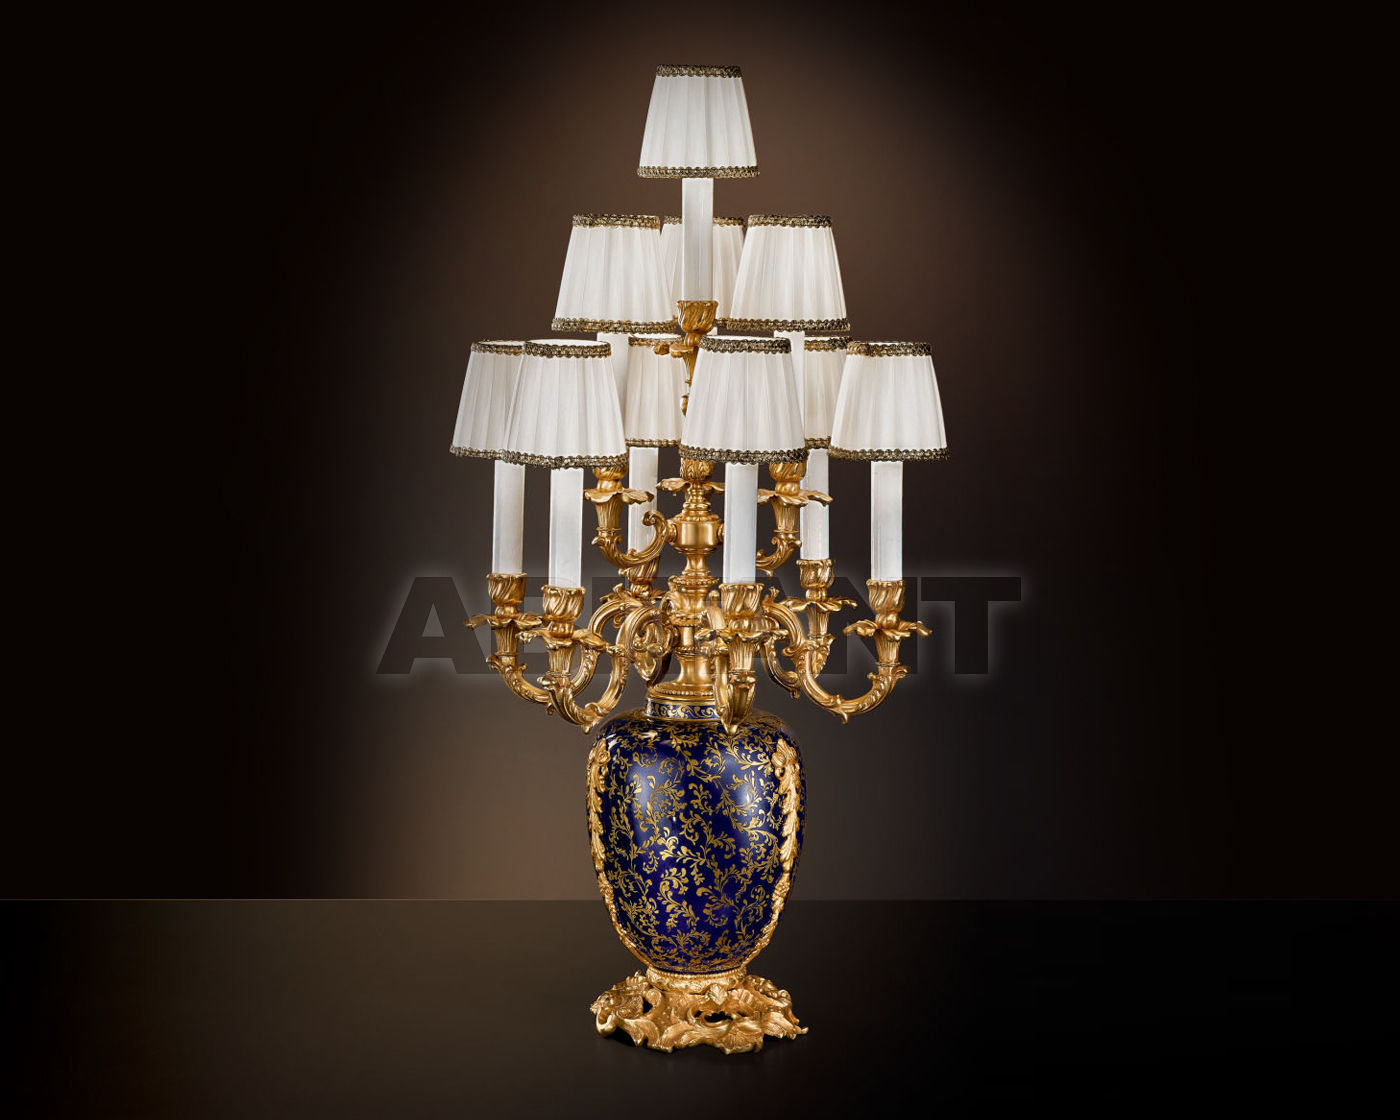 Купить Лампа настольная F.B.A.I. Candeliere 2143/10